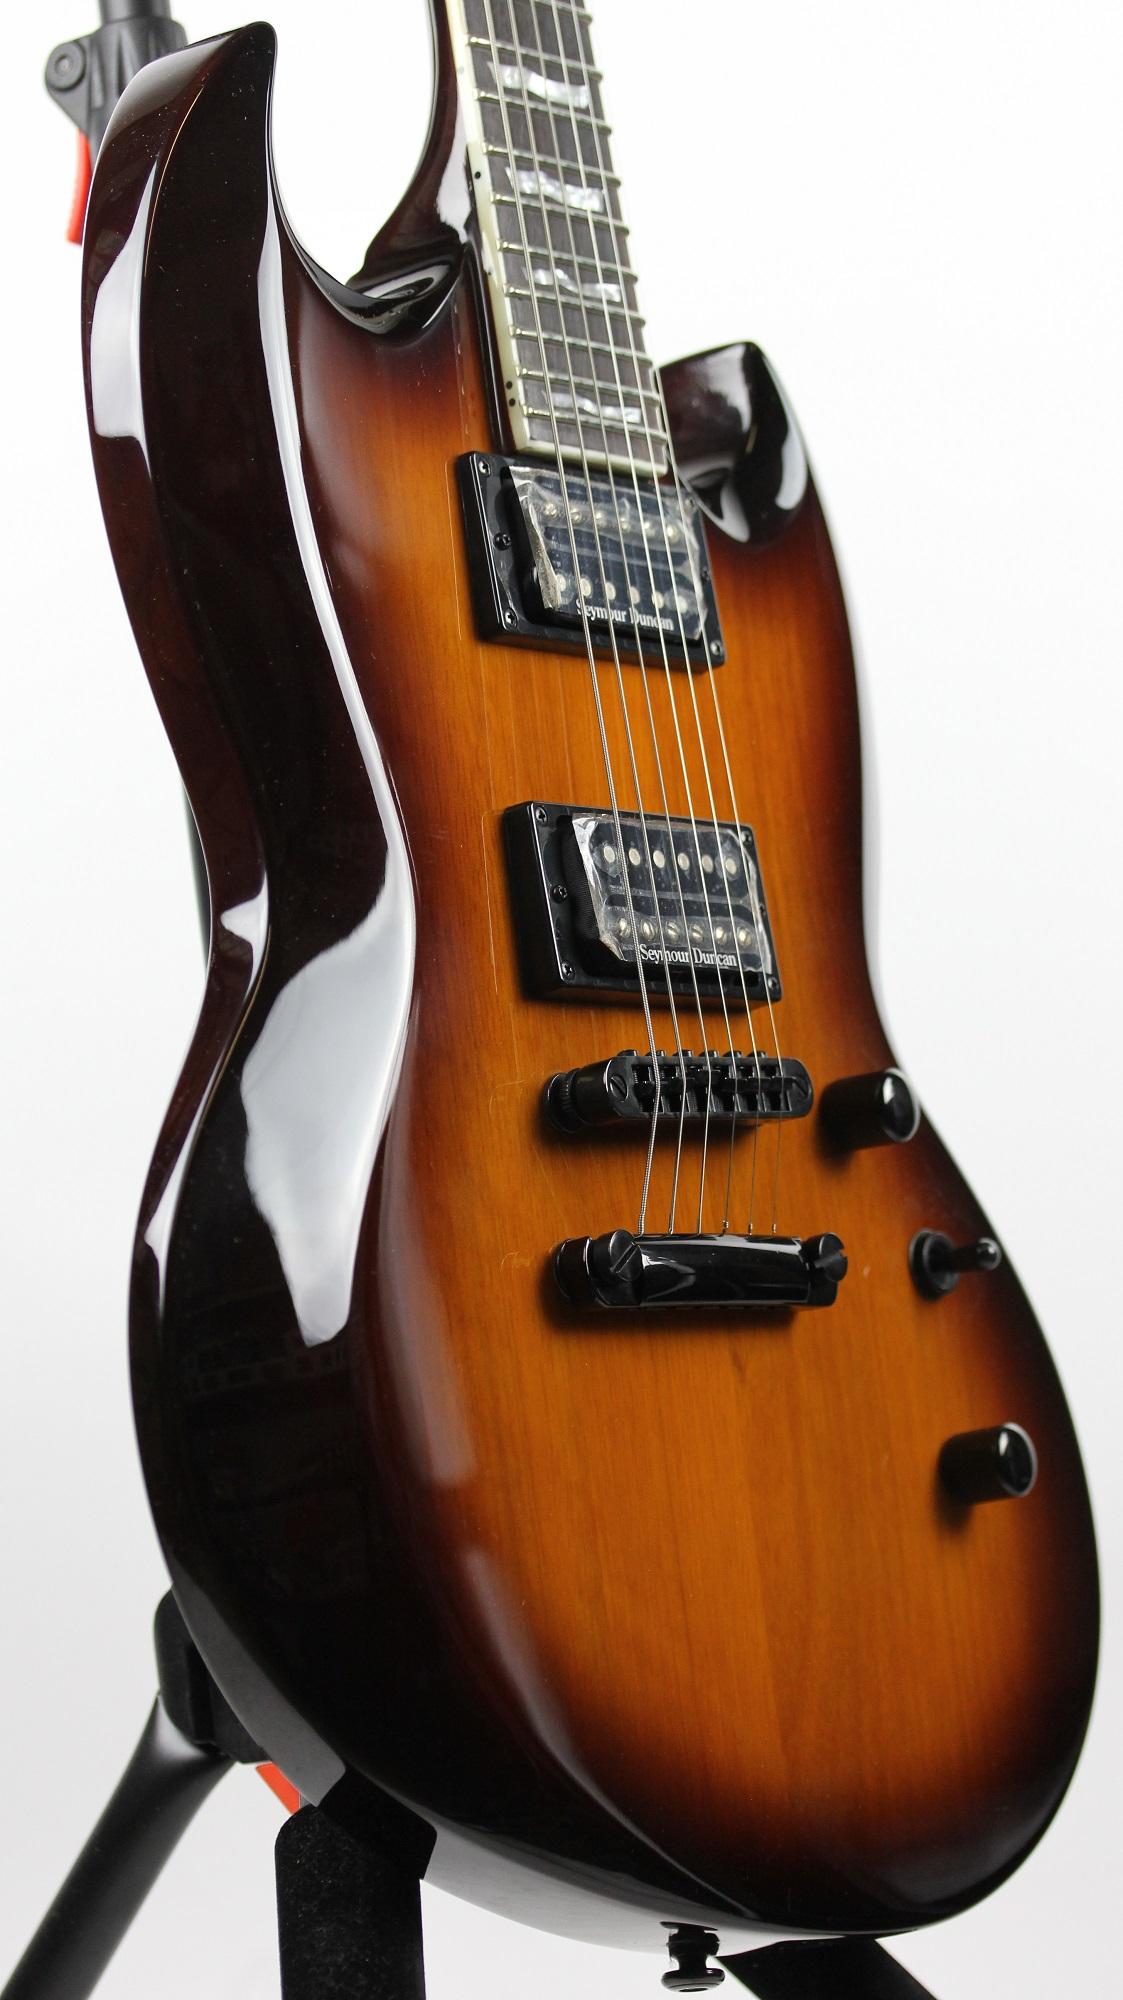 esp ltd viper 400 vintage sunburst sample prototype electric guitar korea 6. Black Bedroom Furniture Sets. Home Design Ideas